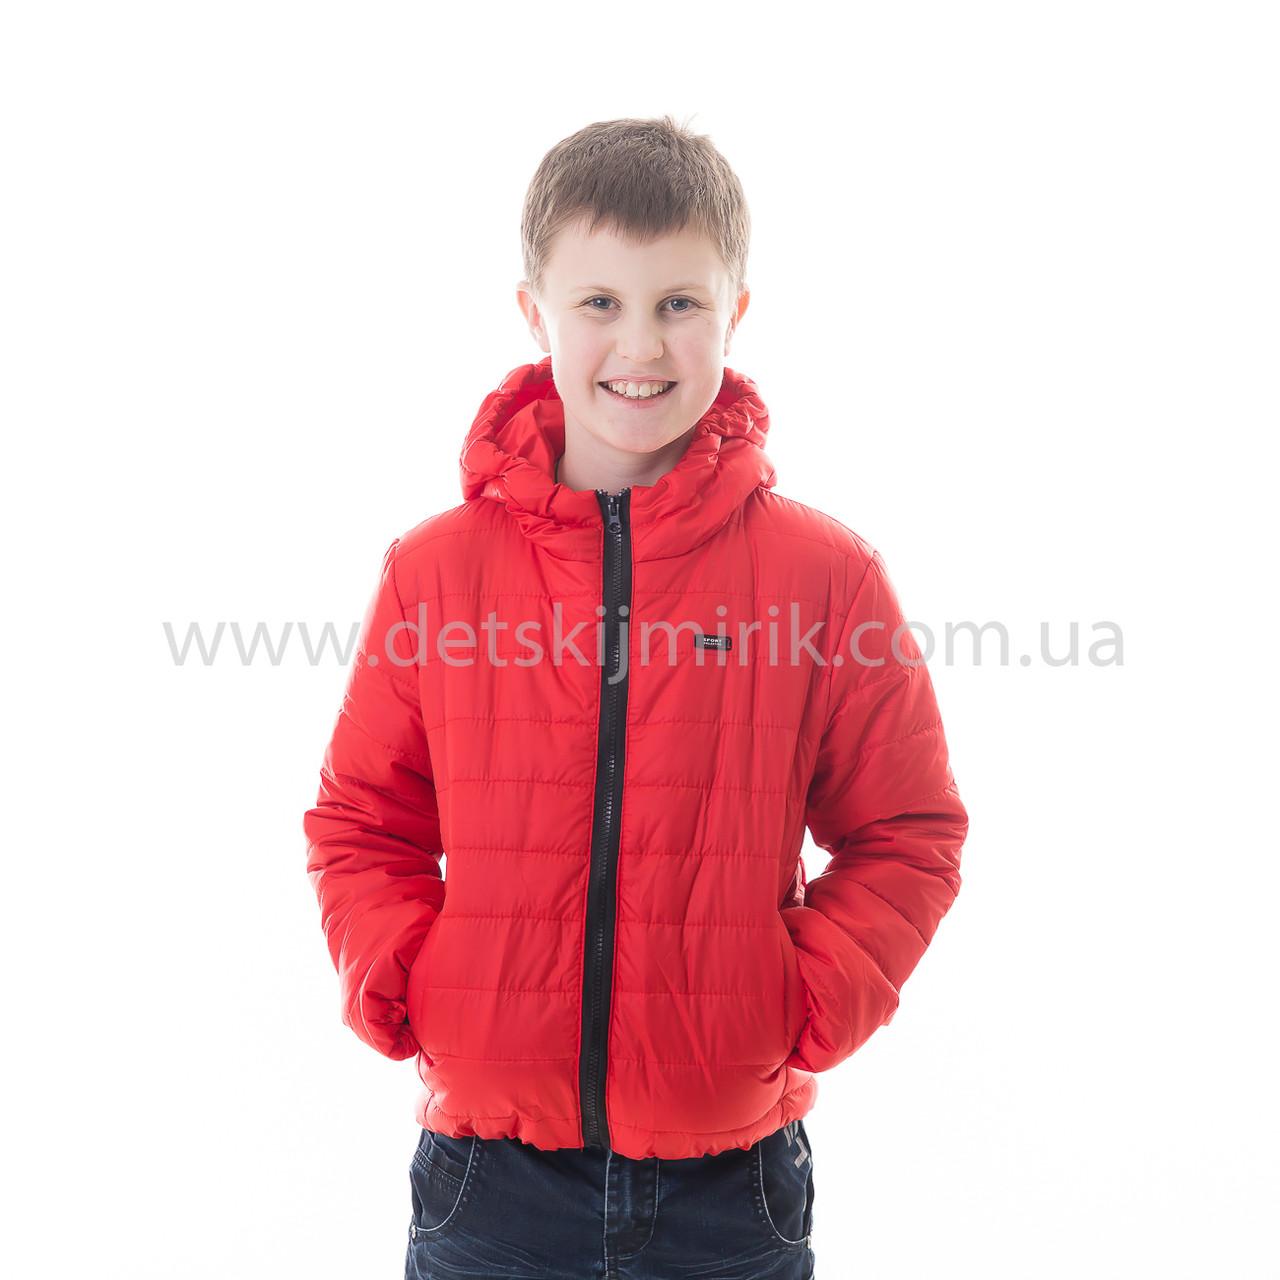 b713ade6eb9b Модная детская парка куртка новинка весна 2016  продажа, цена в ...